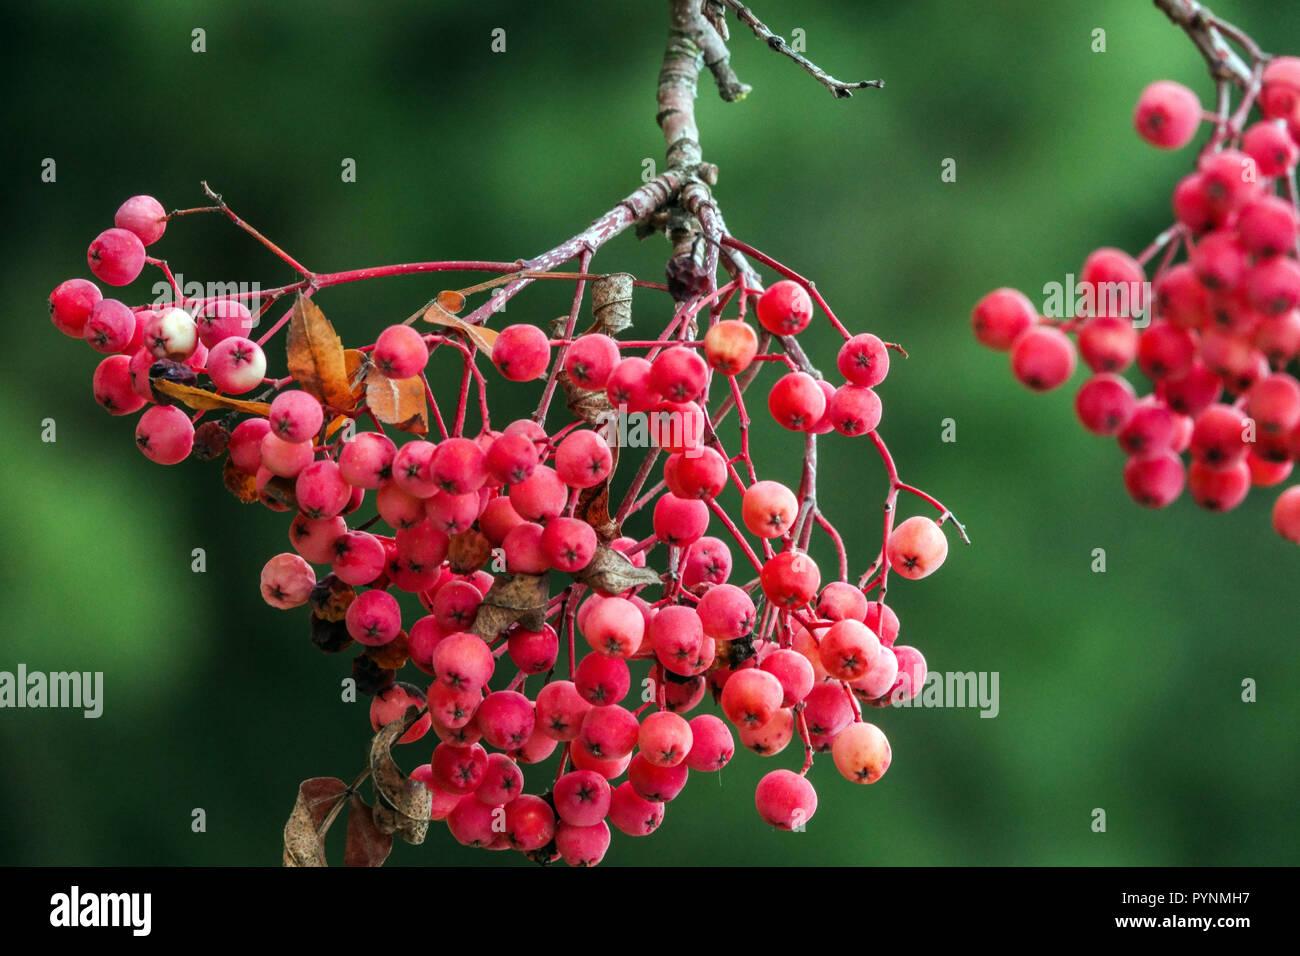 Rowan, Sorbus 'Chamois Glowing Pink', berries - Stock Image